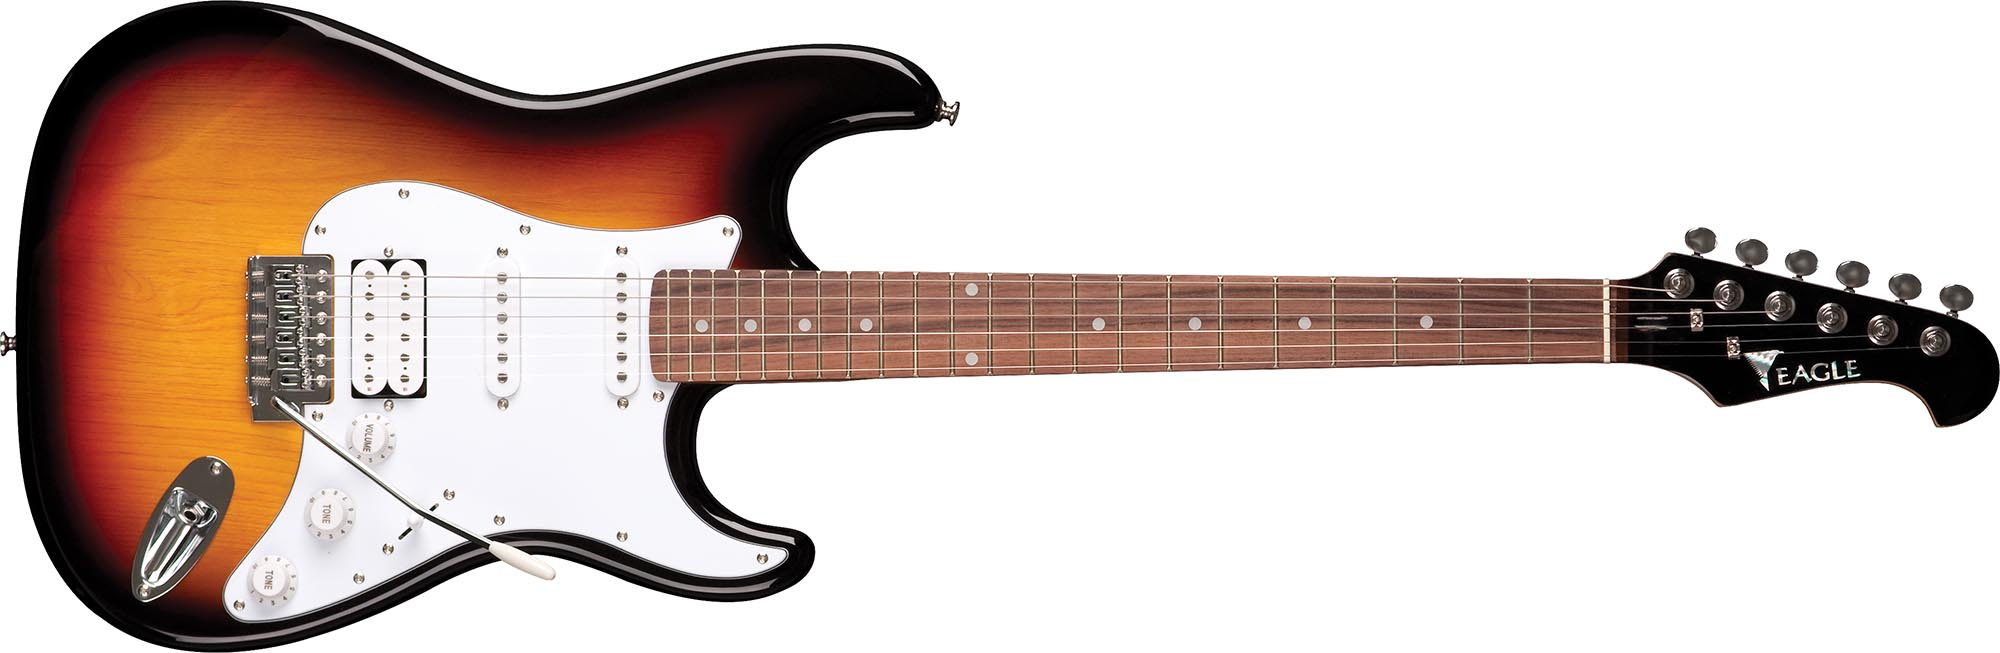 sts002 guitarra eletrica stratocaster captador humbucker eagle sts002 sb sunburst visao frontal